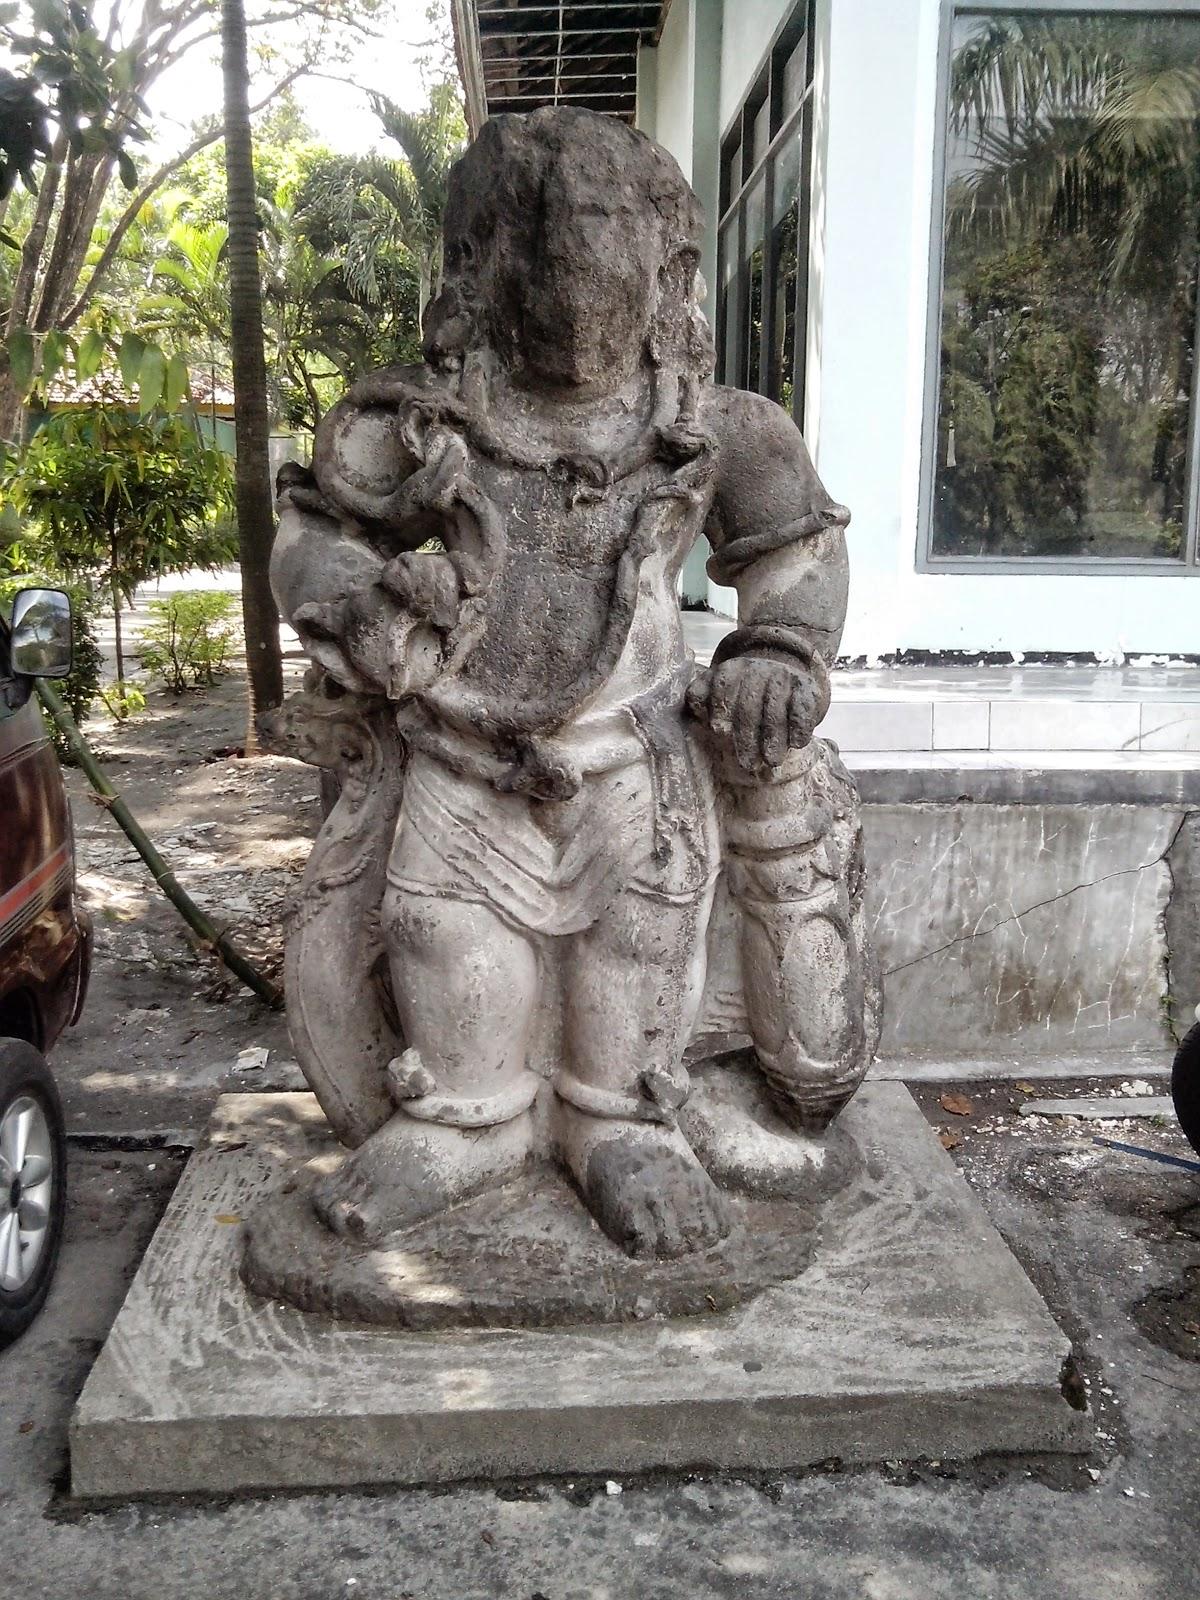 Patung di depan Museum Airlangga Kodya Kediri